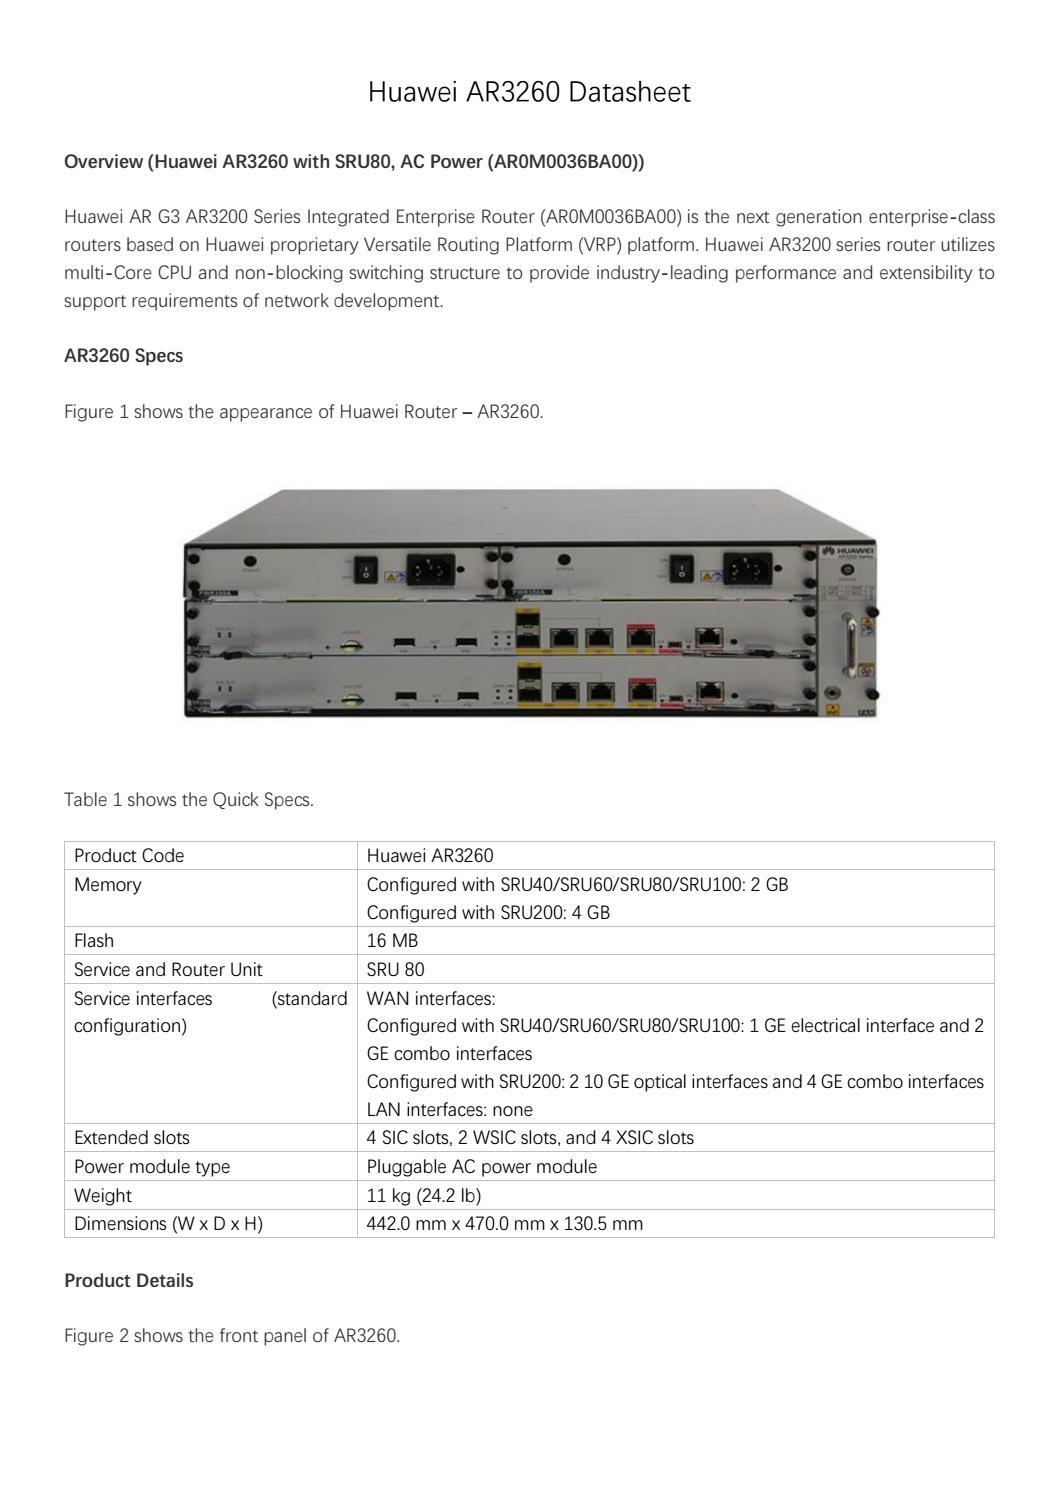 Huawei 2811 datasheet